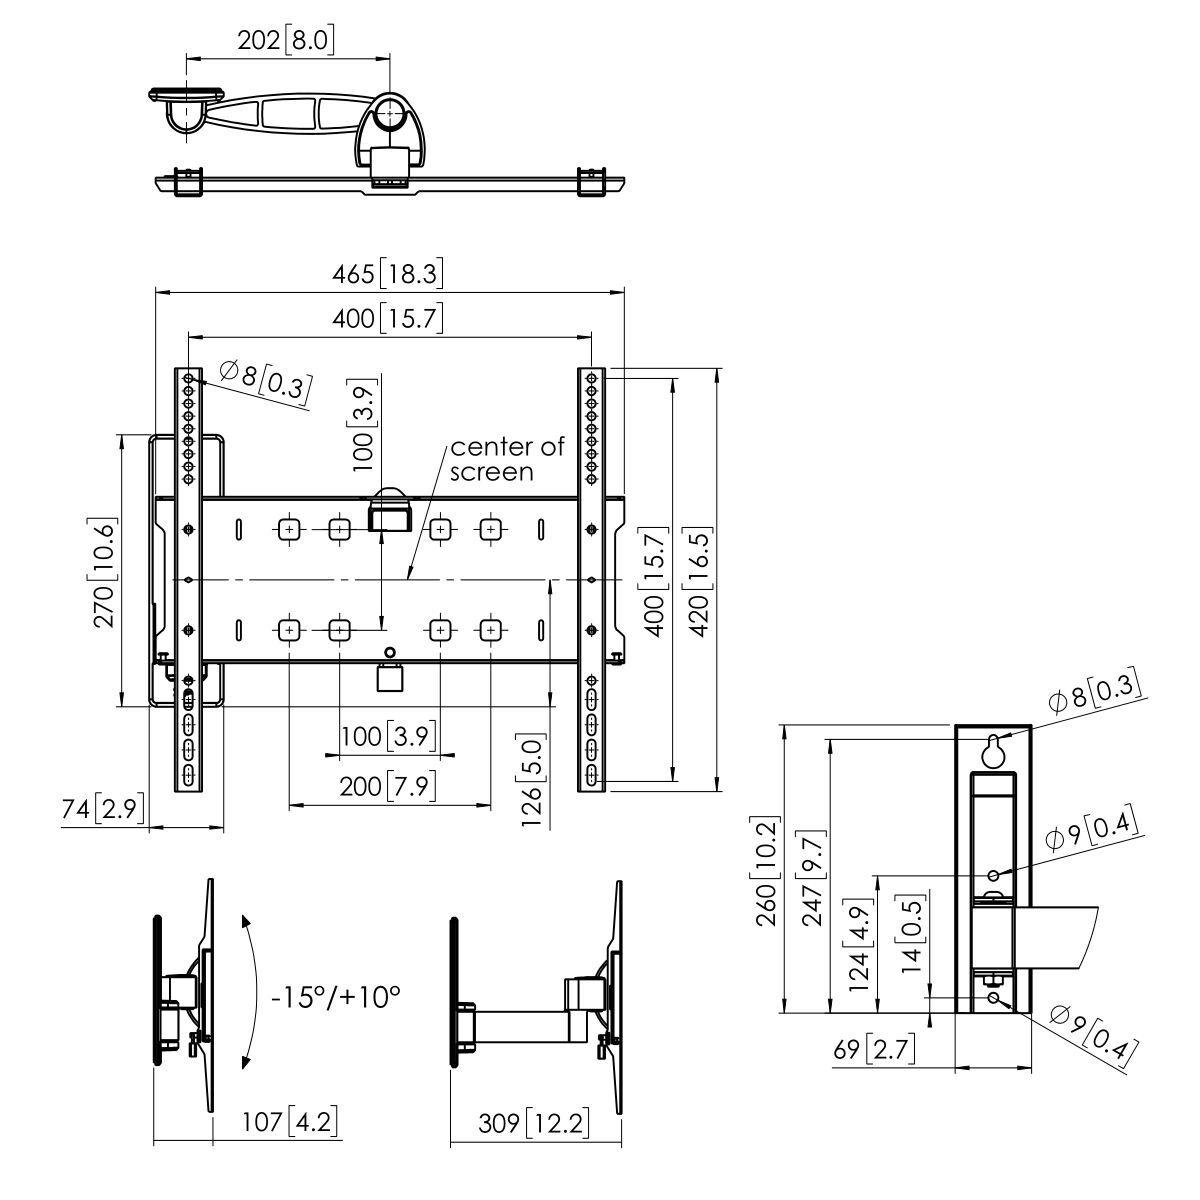 Vogel's PFW 3030 Uchwyt ścienny obrotowy - Dimensions